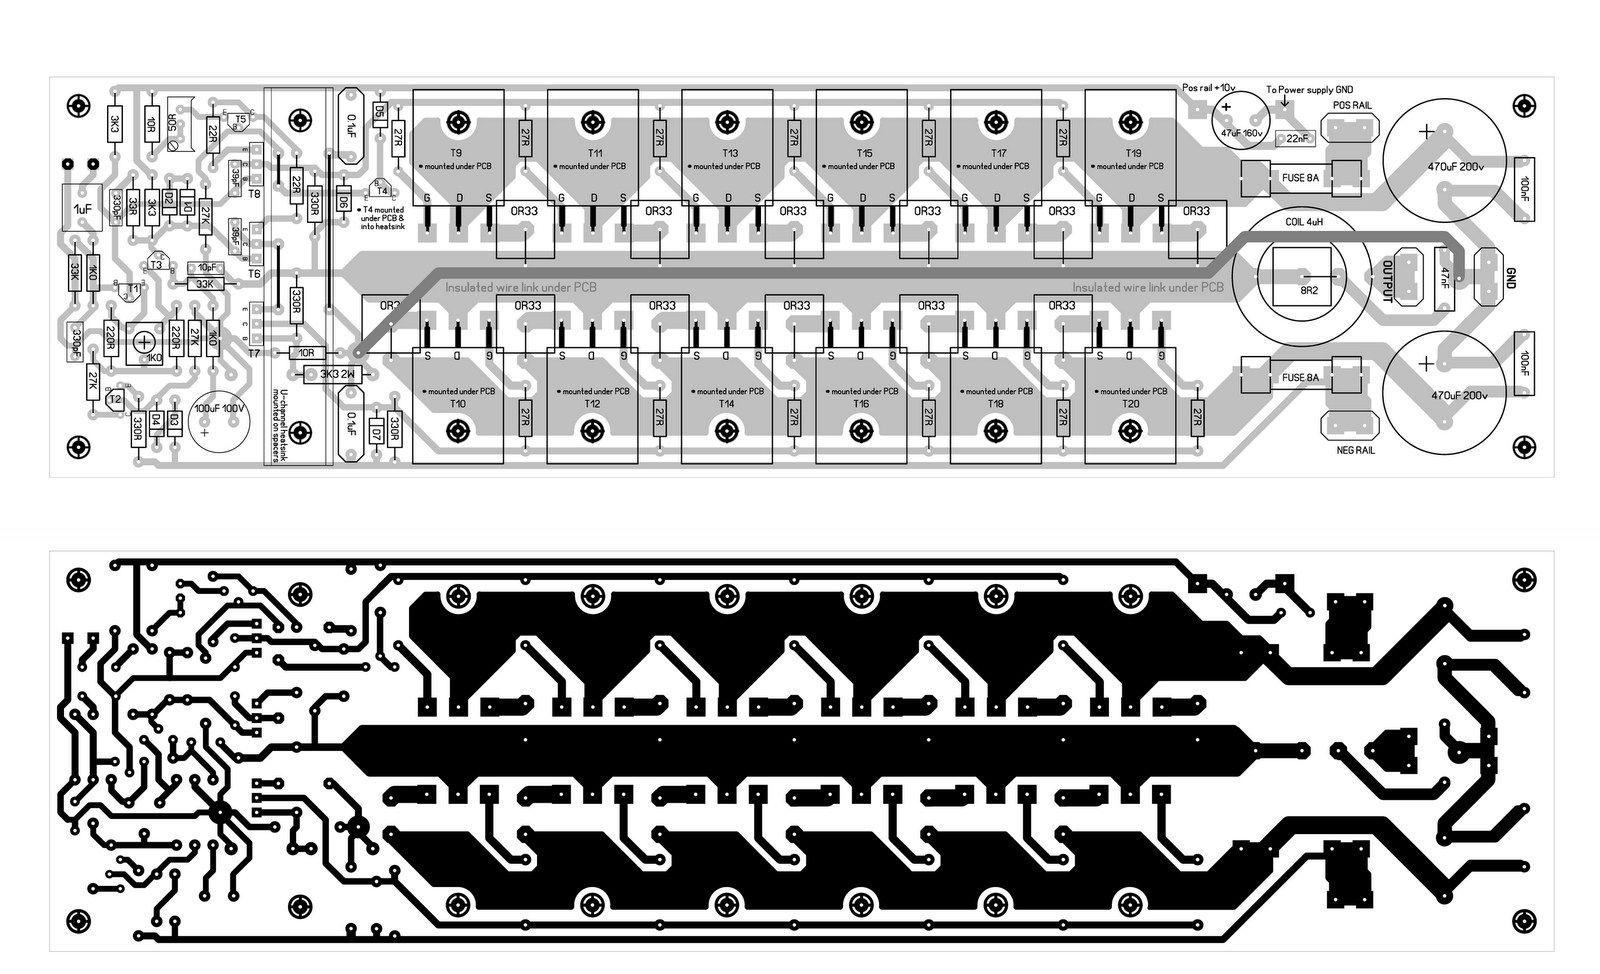 600W Mosfet Power Amplifier PCB Design | Circuit diagram ...